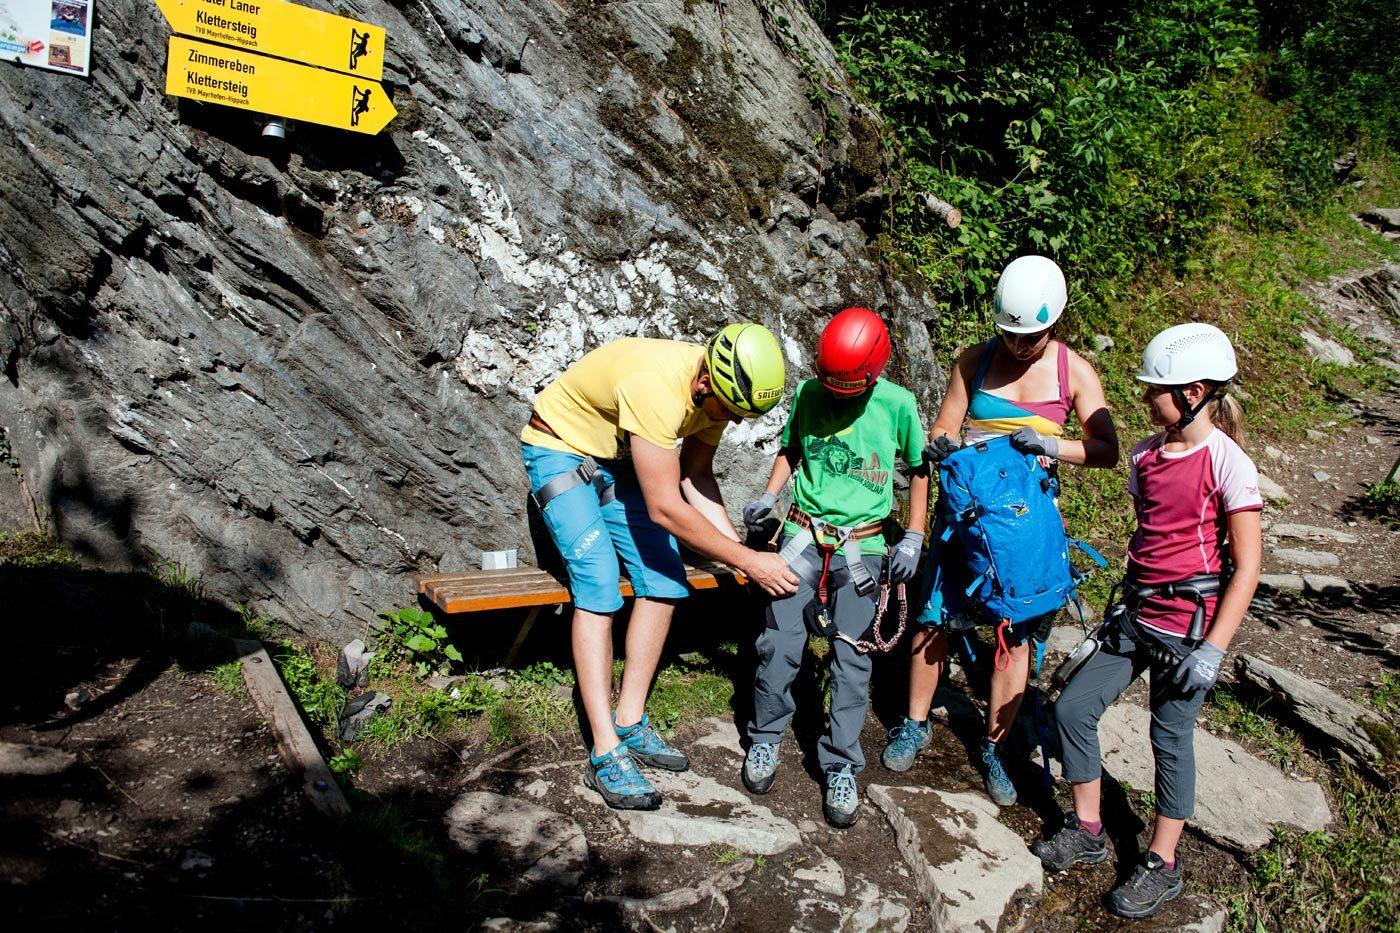 Klettersteig Huterlaner : Familienklettersteig · mayrhofen mountainshop hörhager